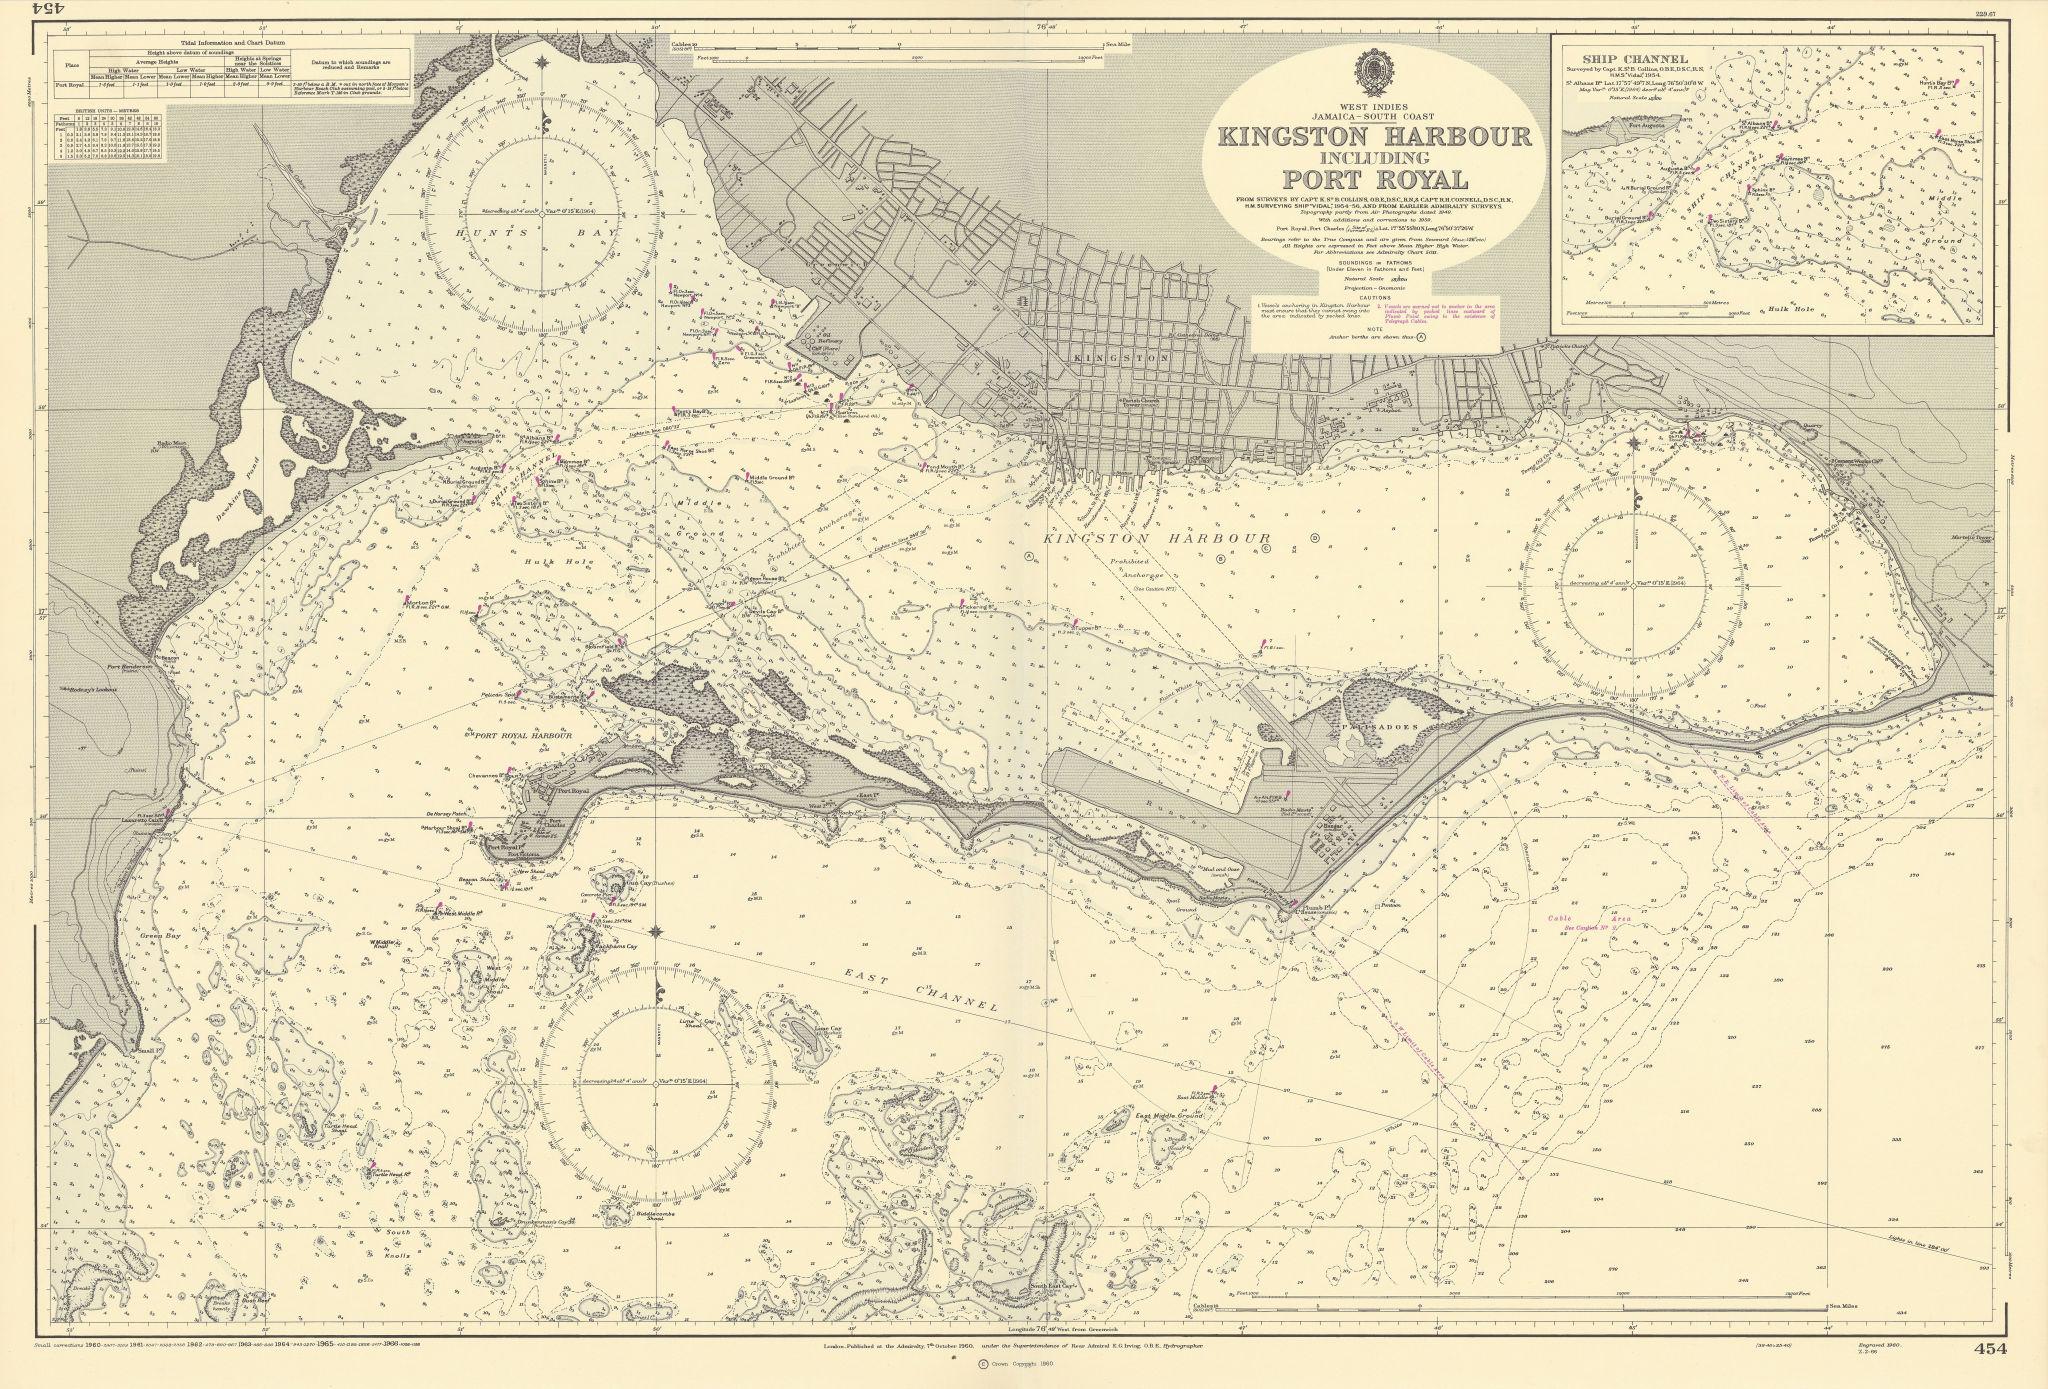 Kingston Harbour Port Royal Jamaica Caribbean ADMIRALTY chart 1960 (1966) map